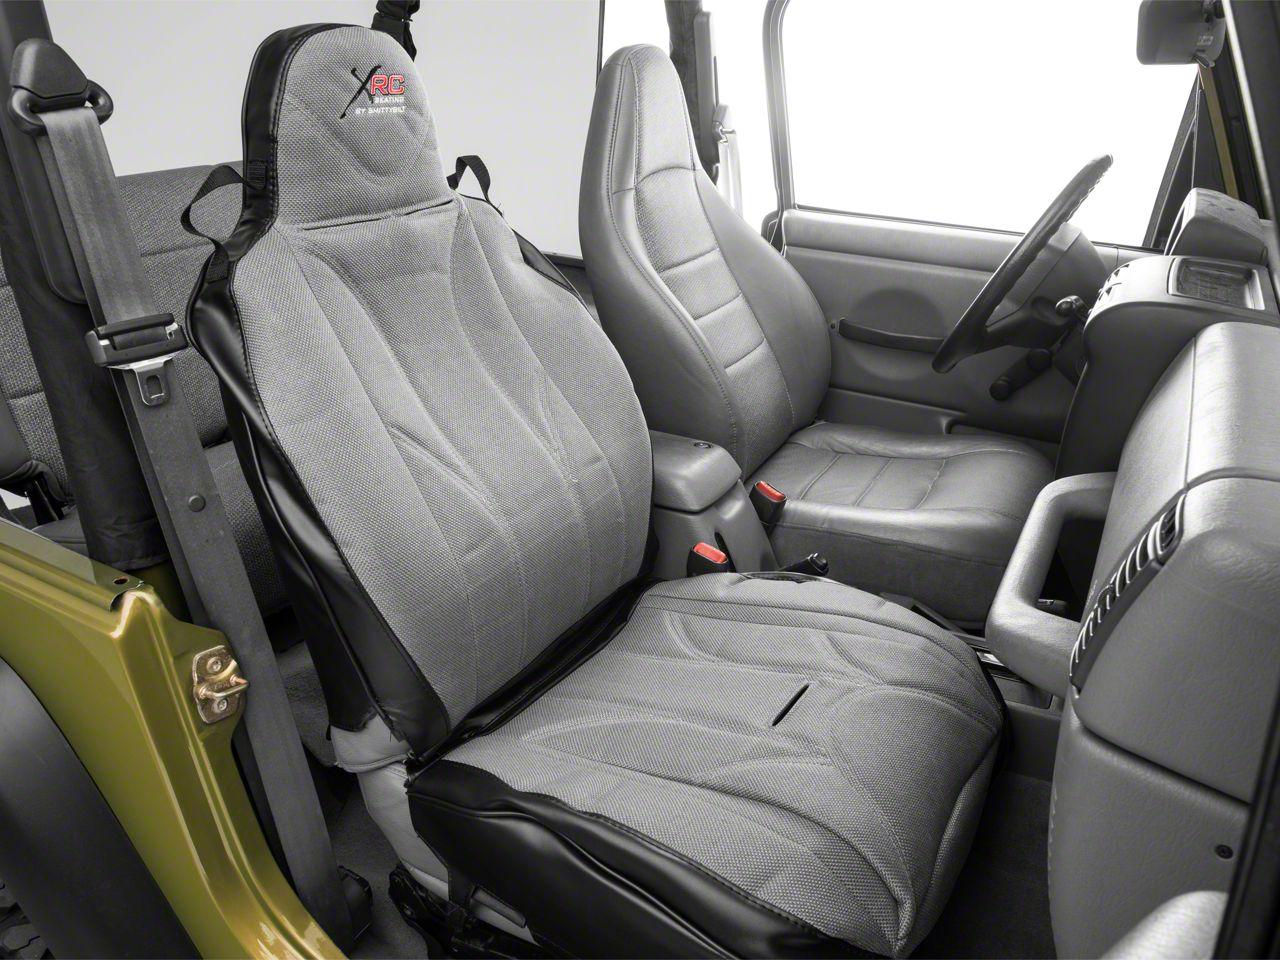 Smittybilt XRC Performance Front Seat Cover - Passenger Side (87-18 Jeep Wrangler YJ, TJ, JK & JL)